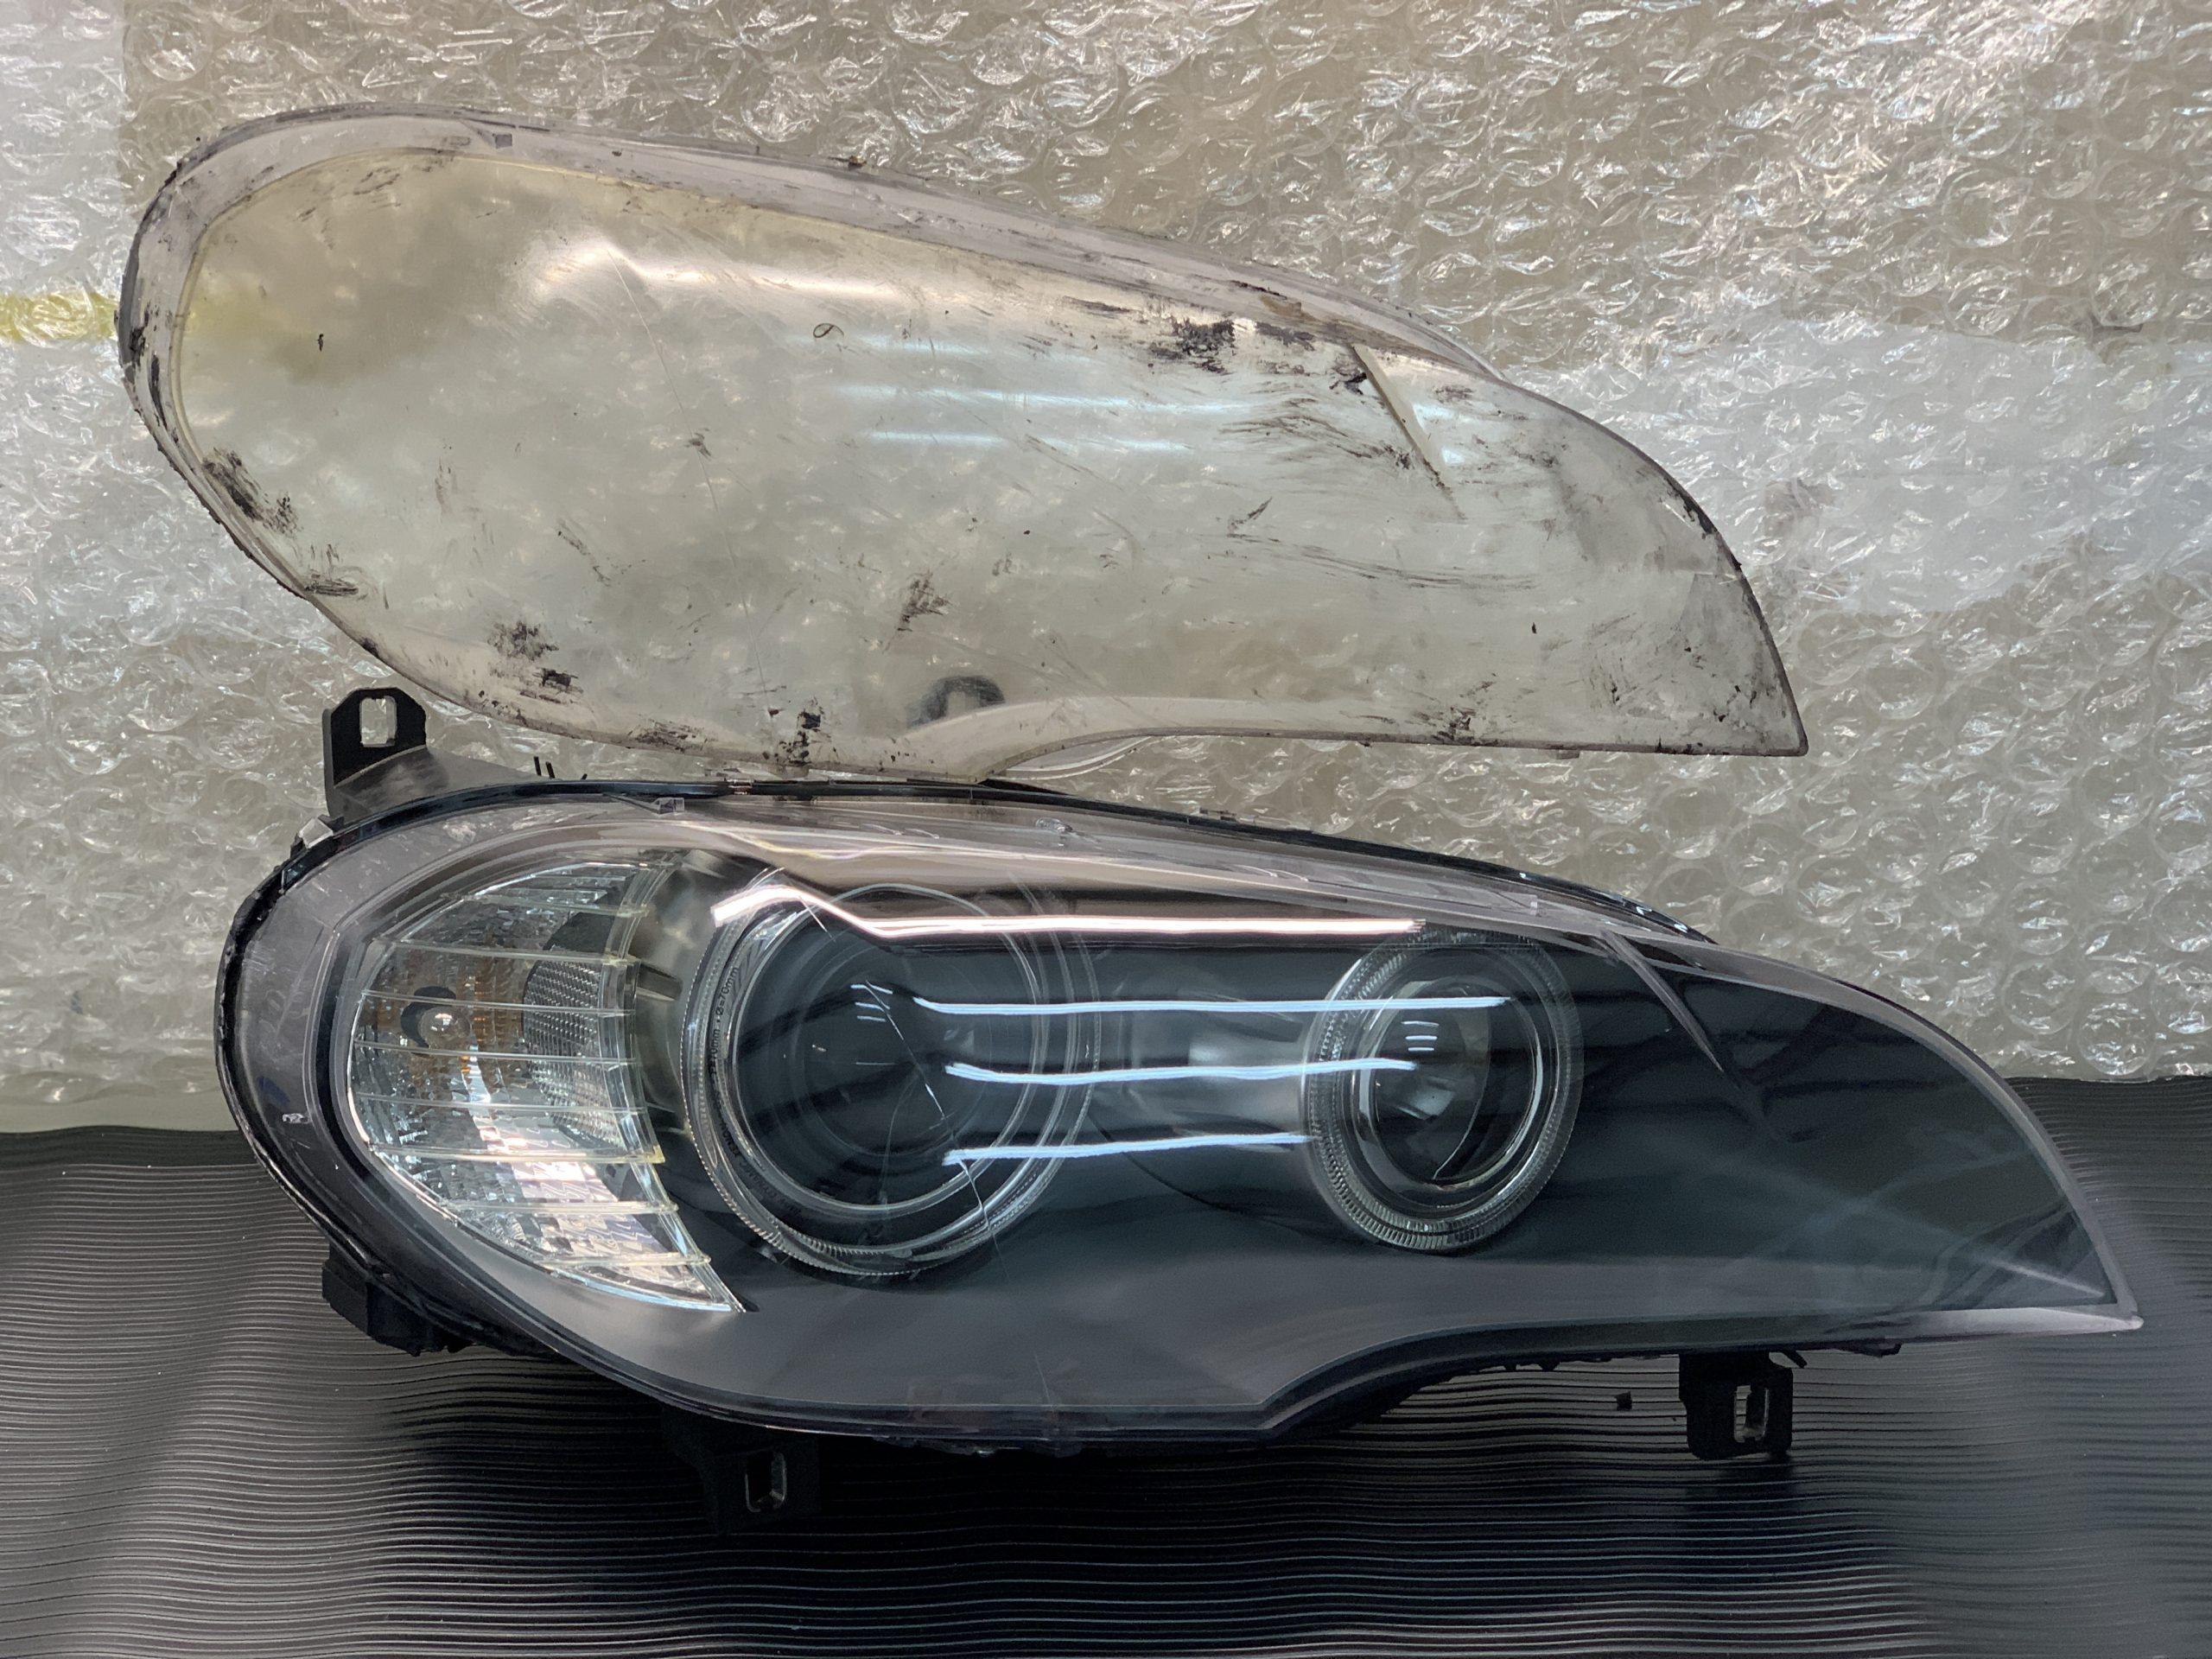 2007 12 Bmw X5 E70 Headlight Lens Replacement Service